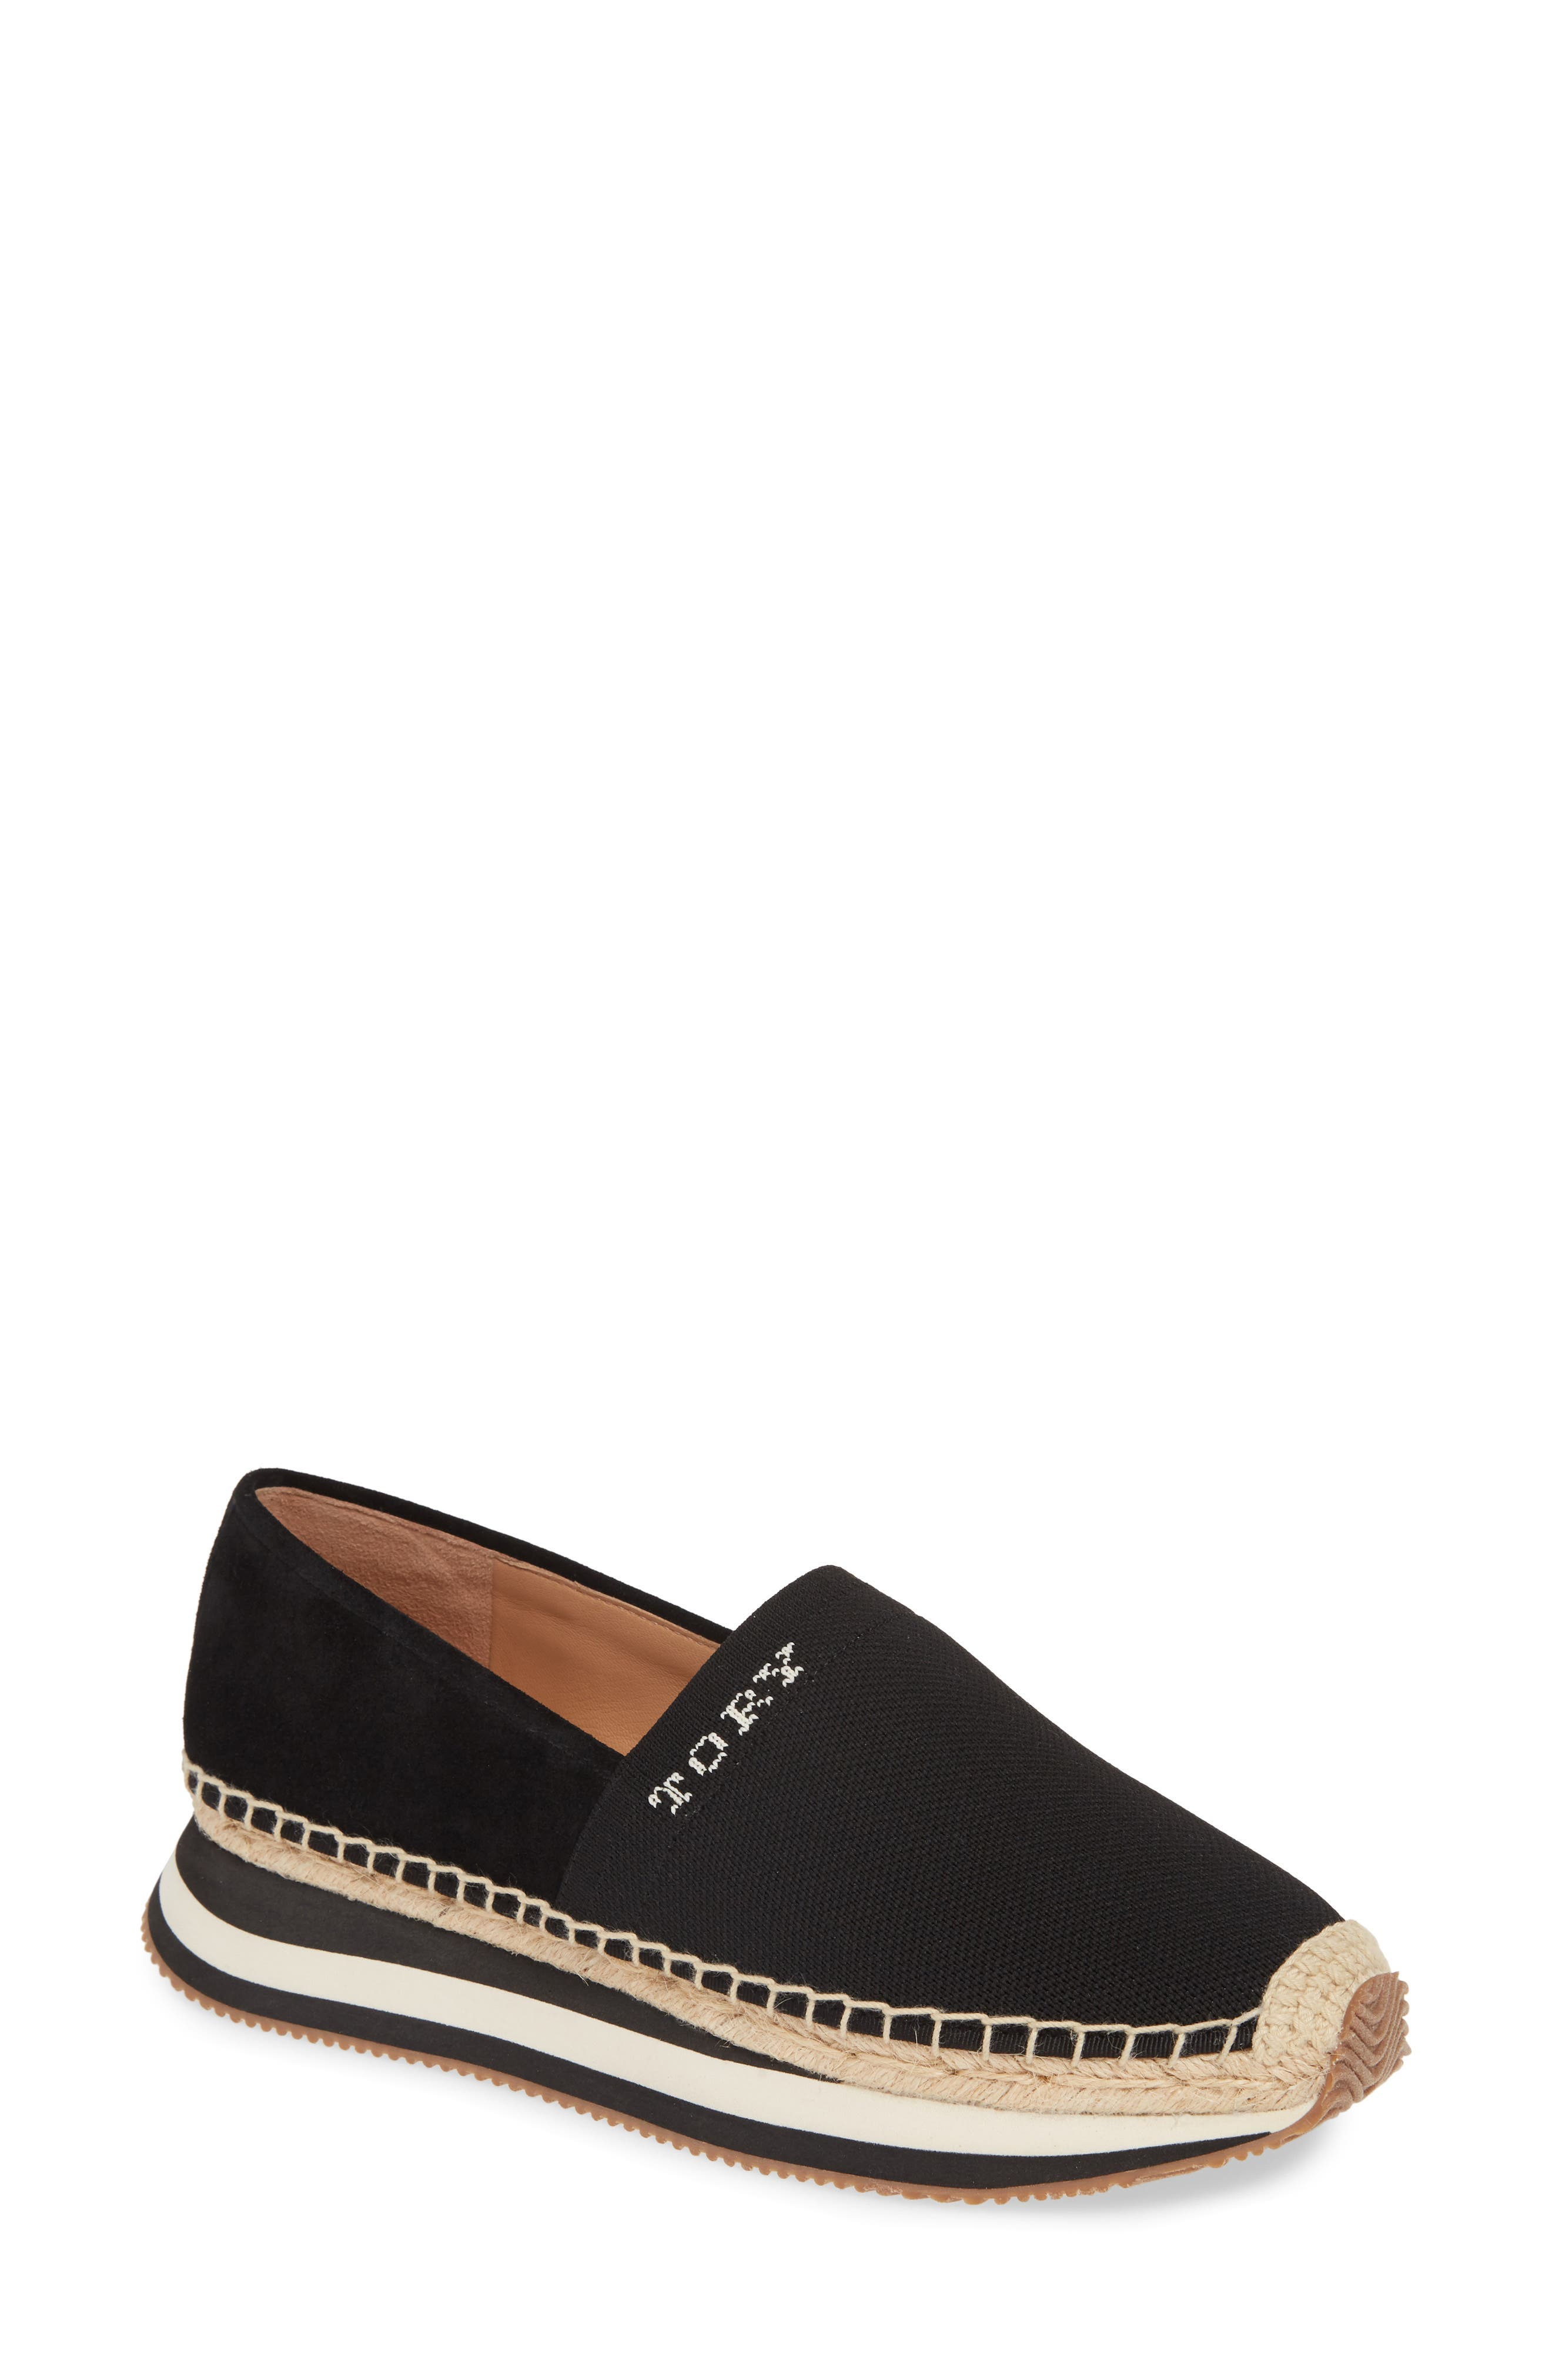 Tory Burch Daisy Logo Espadrille Sneaker- Black